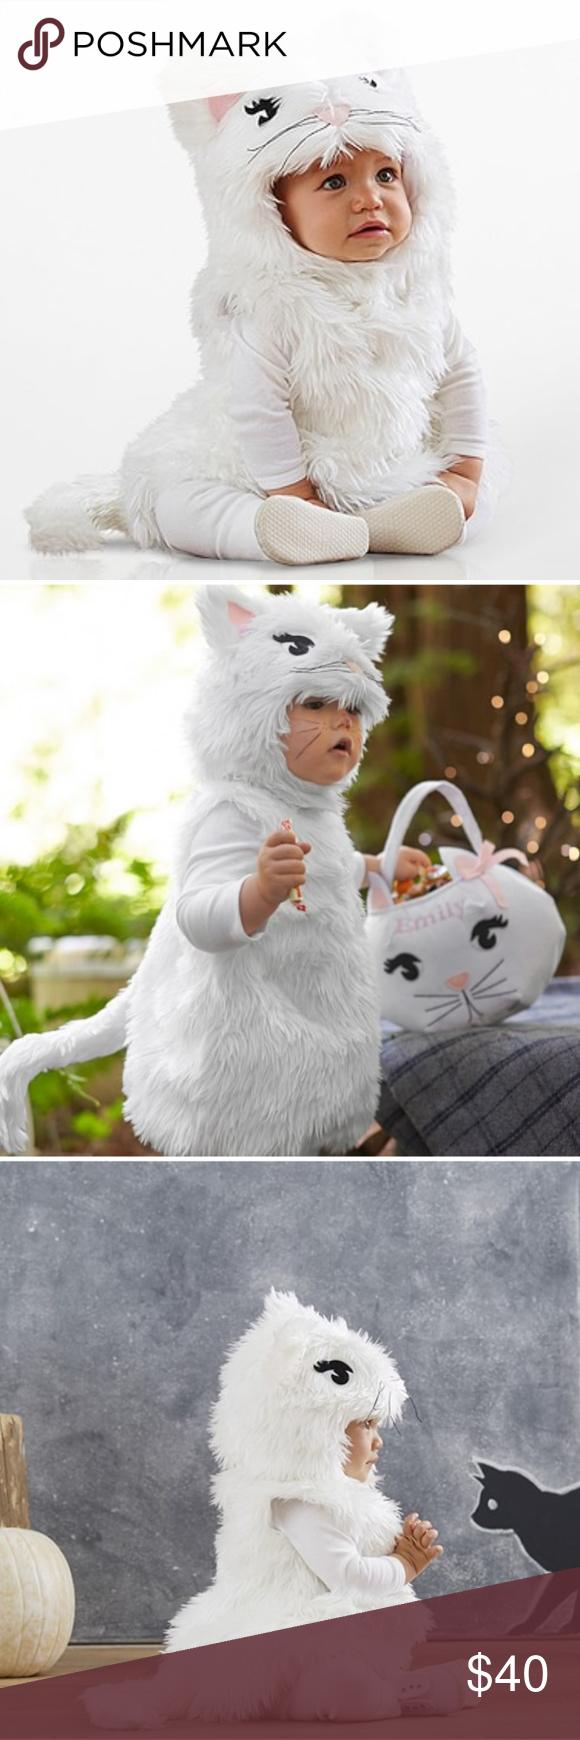 Pottery barn baby cat costume NEVER WORN...she wasn't